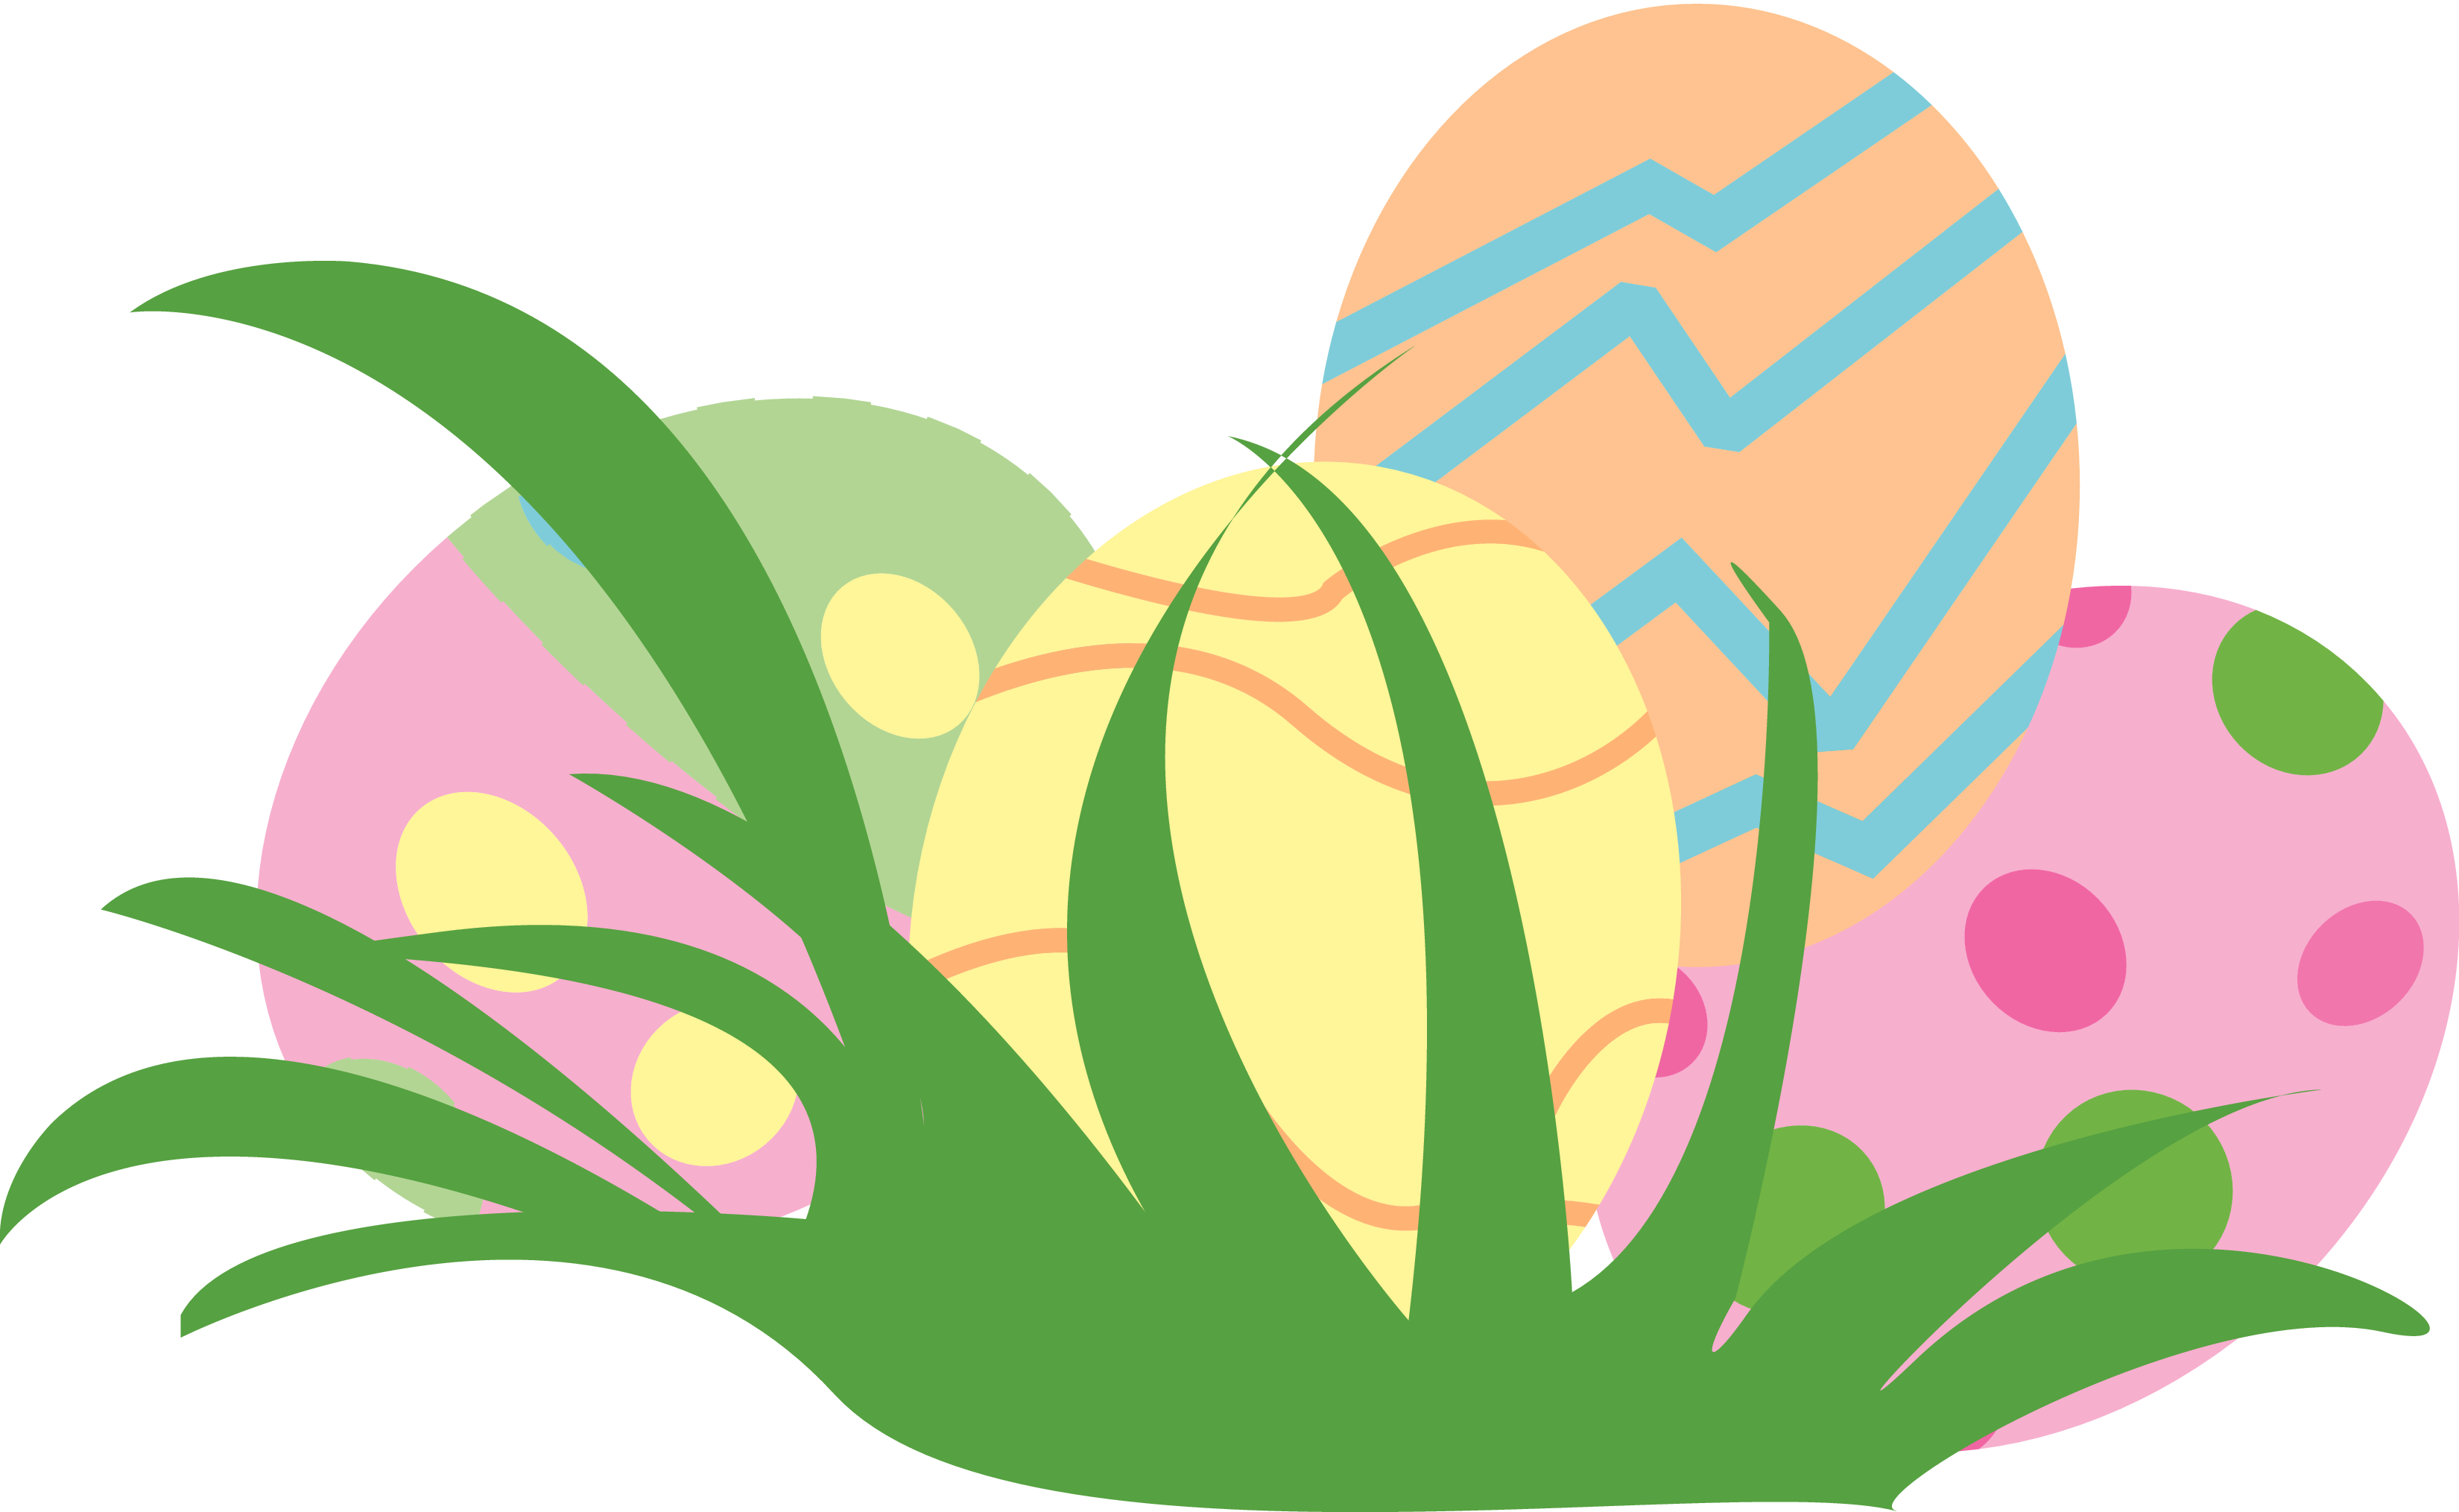 Easter Clip Art Images .-Easter Clip Art Images .-11